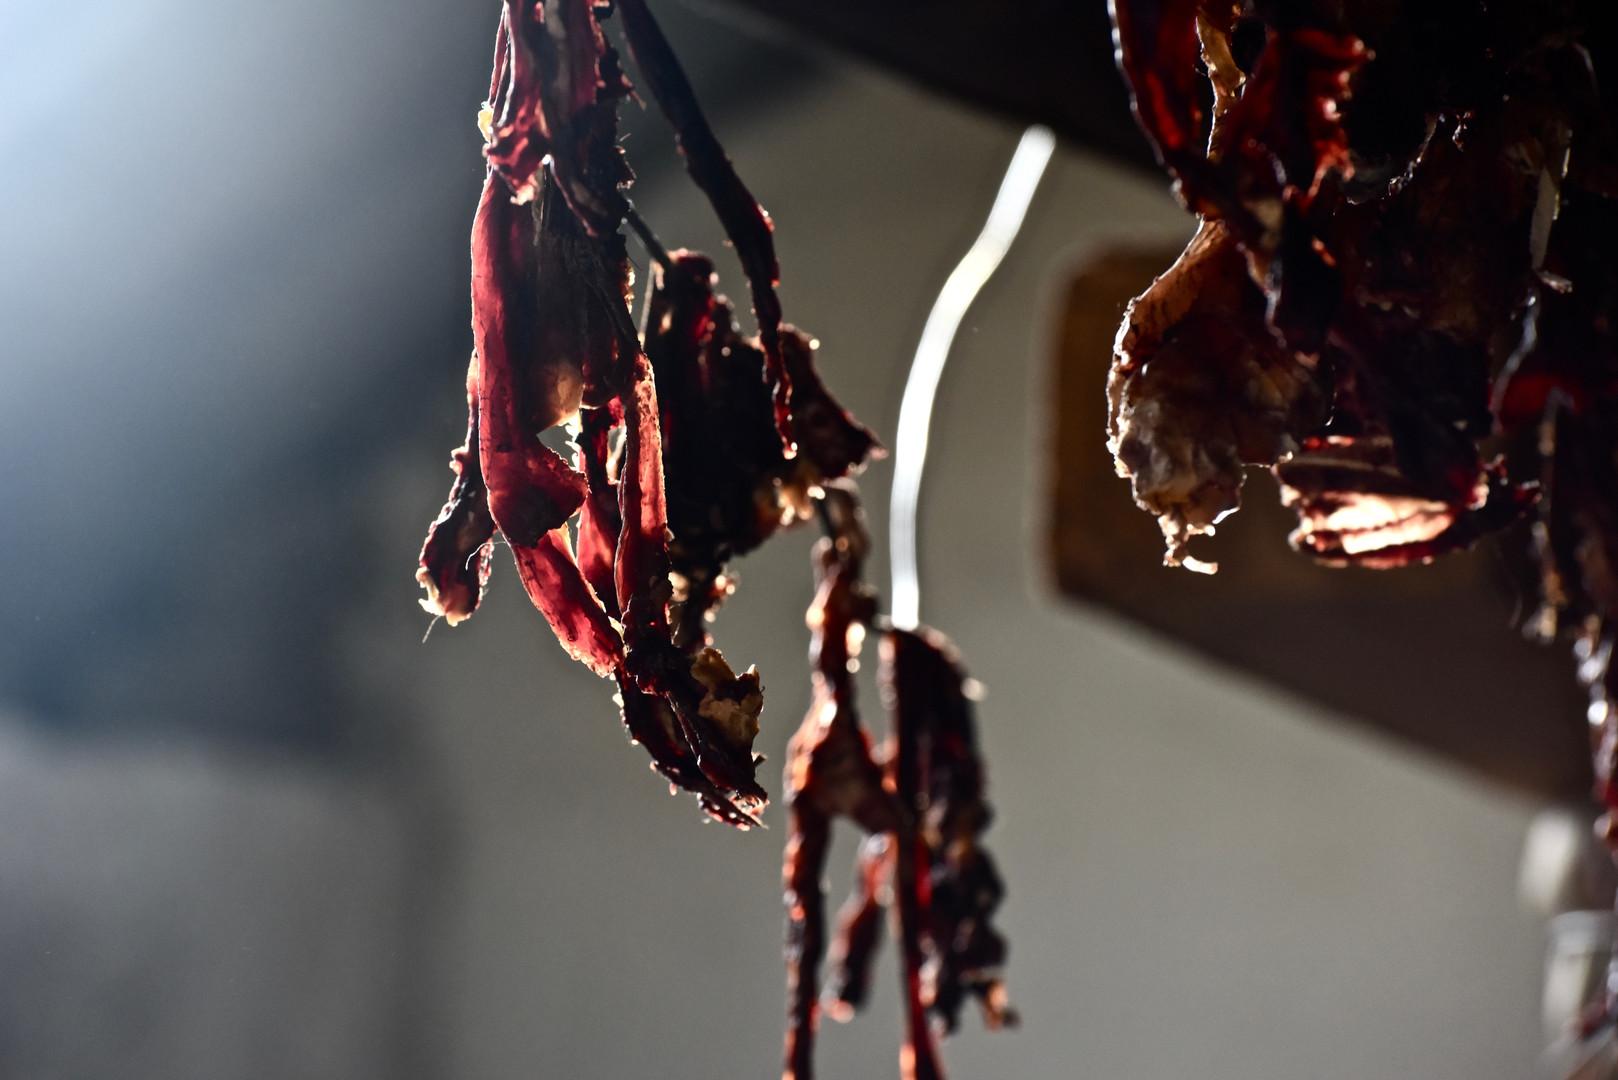 Driying Yak Meat